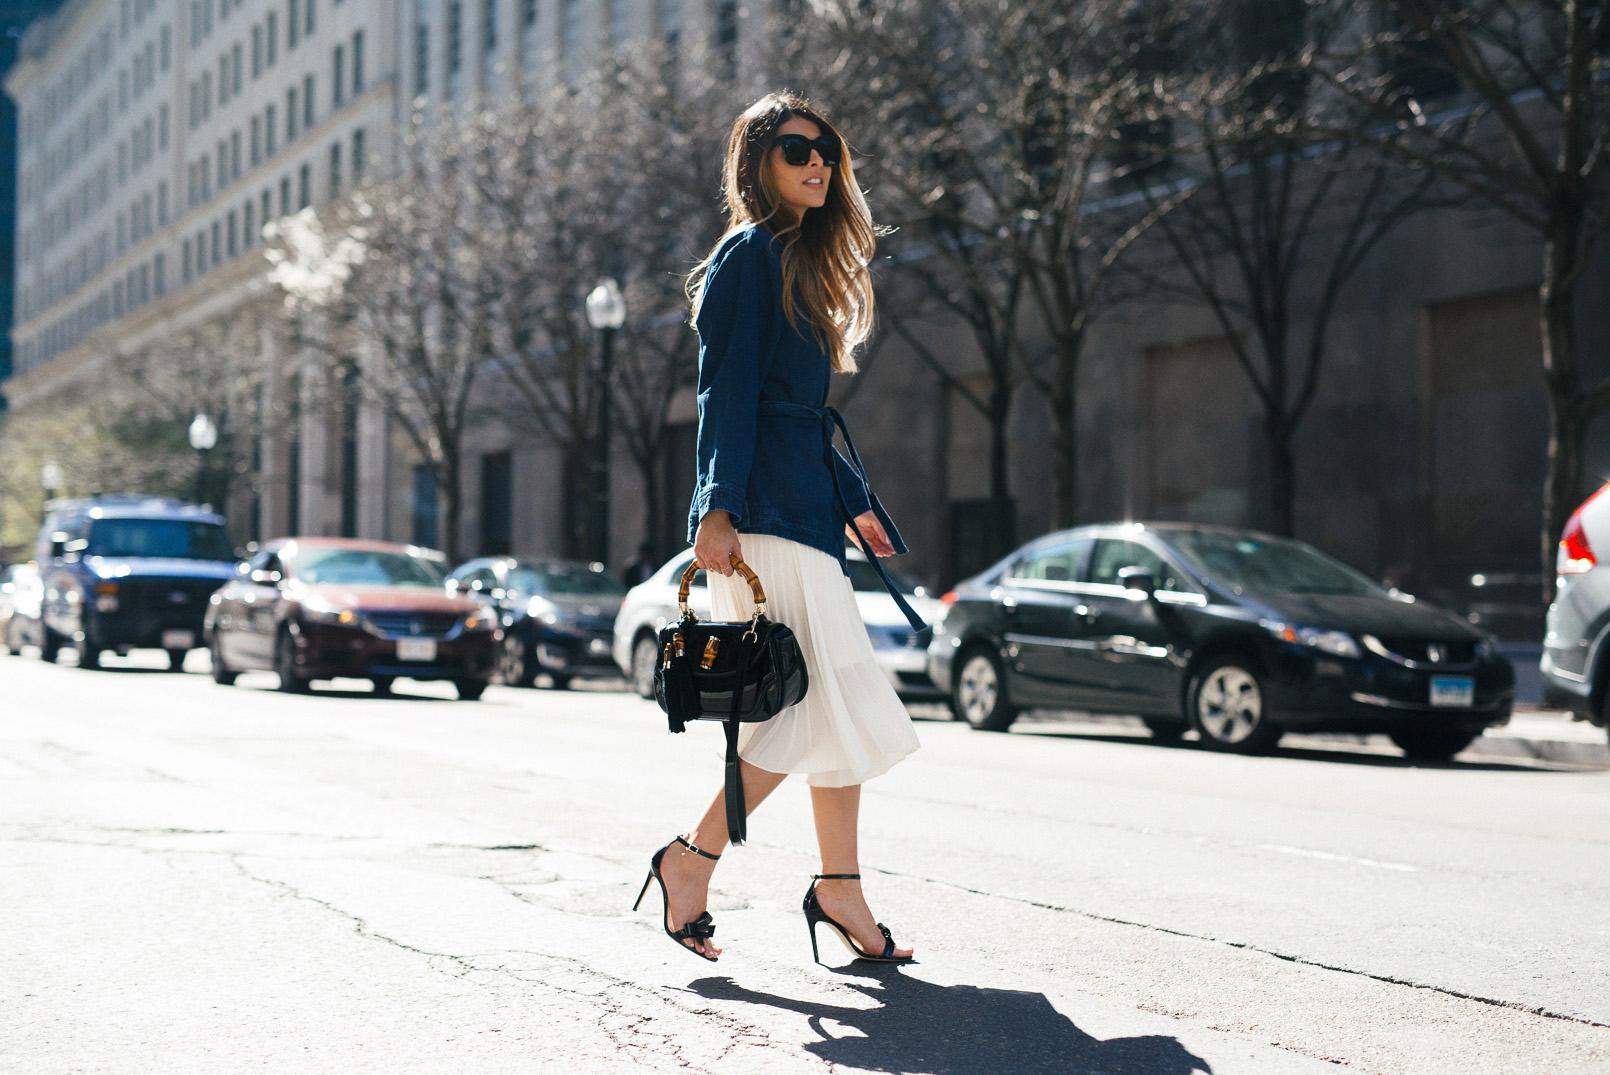 express-midi-pleated-skirt-m.gemi-ankle-strap-heeled-sandals-new-look-denim-wrap-coat-gucci-bamboo-top-handle-bag-celine-sunglasses-9-copy.jpg